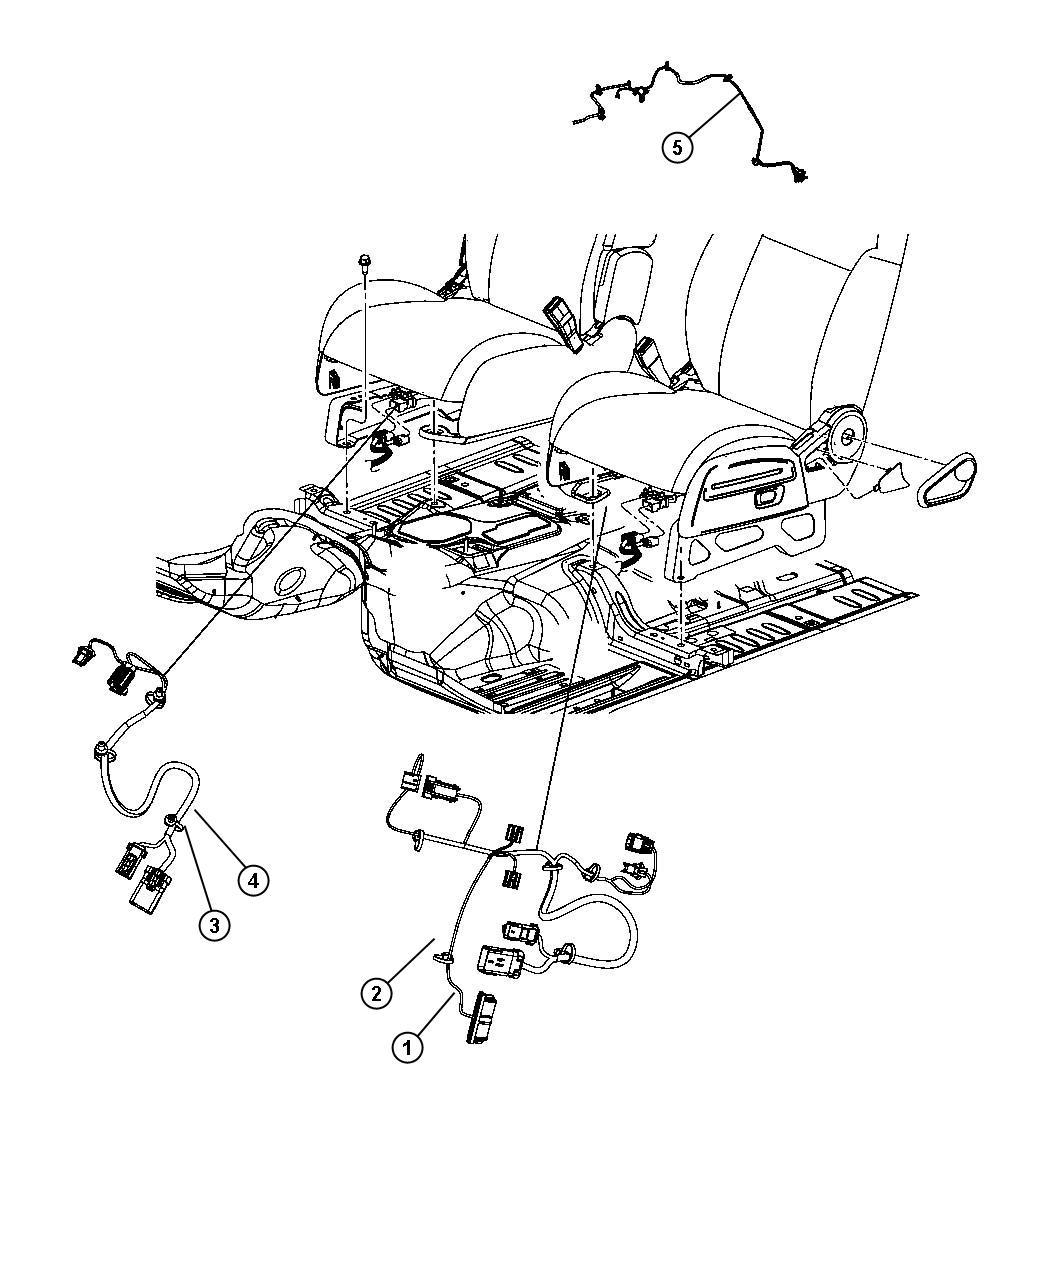 Jeep Liberty Wiring Power Seat 2 Way Heated Trim